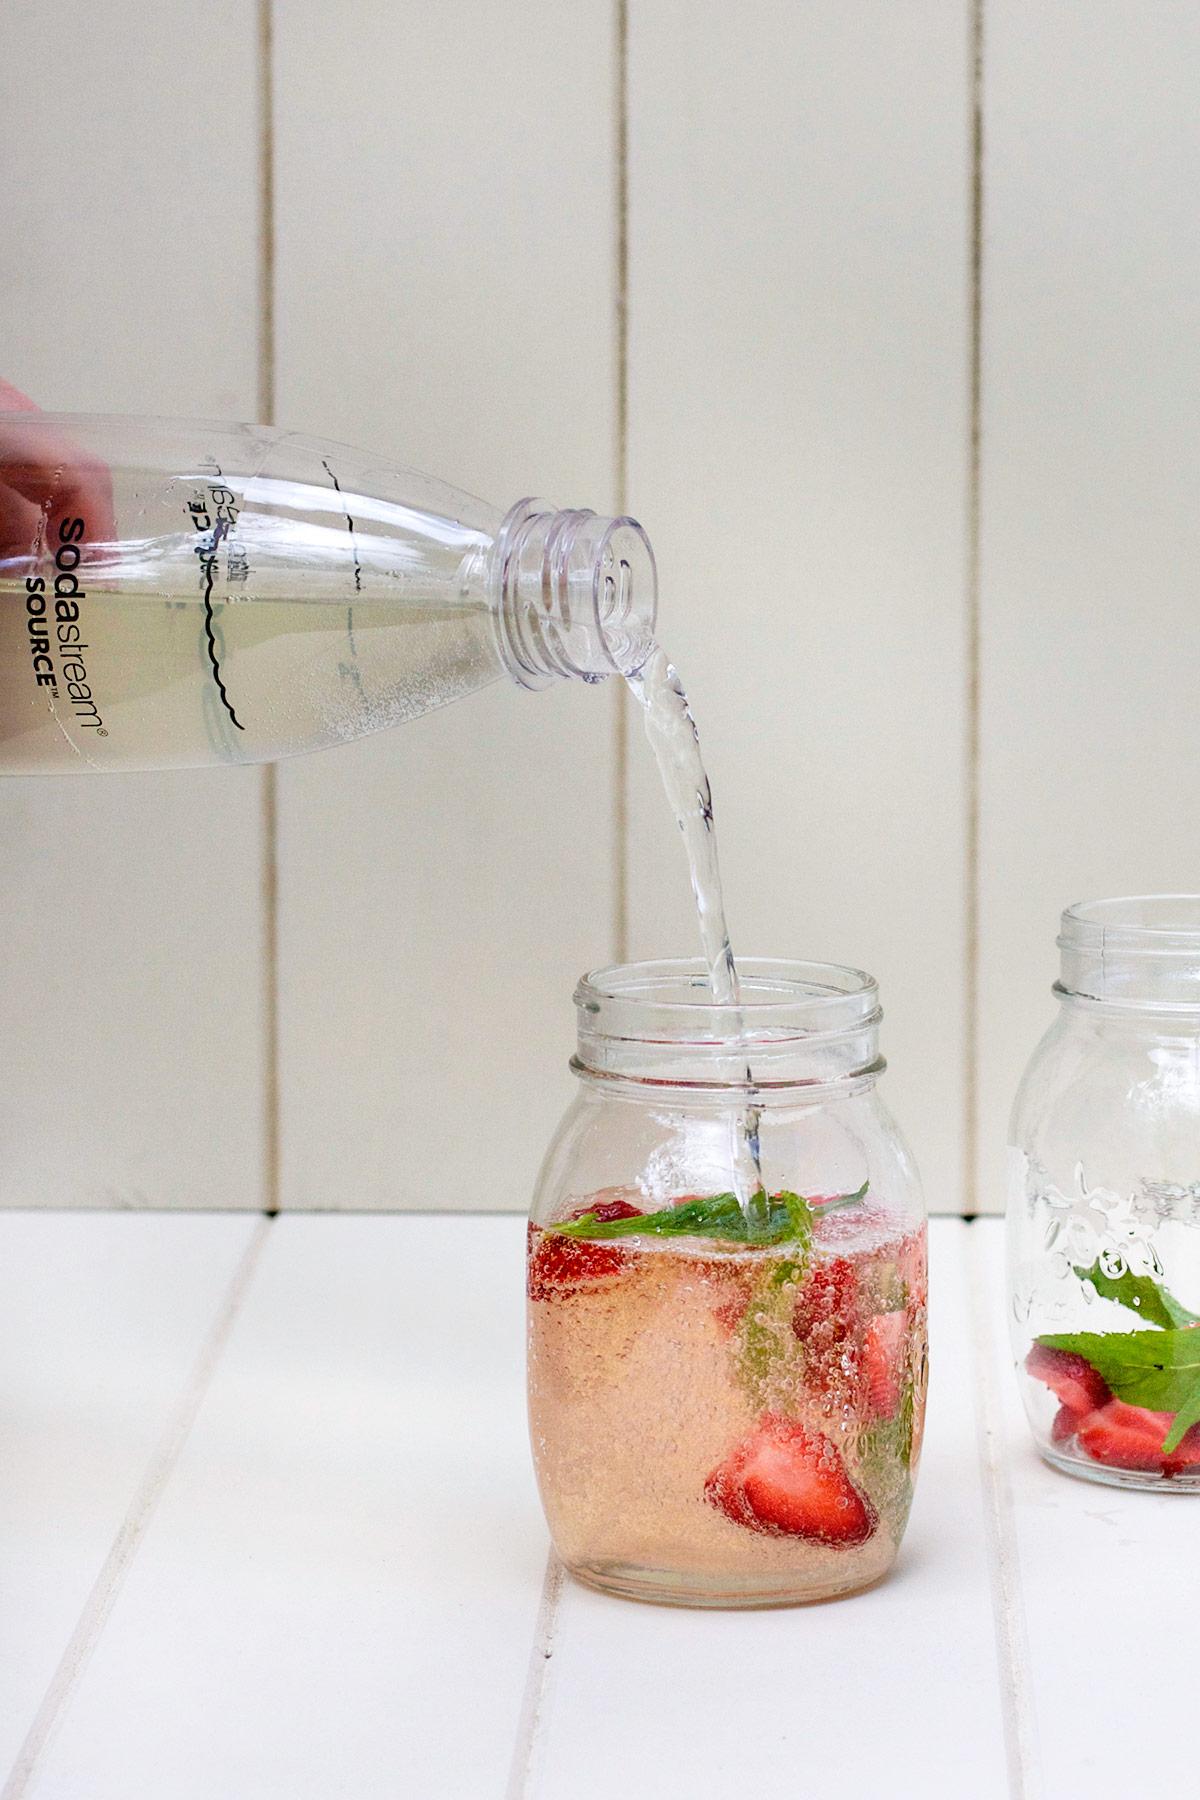 sodastream-lemonade5